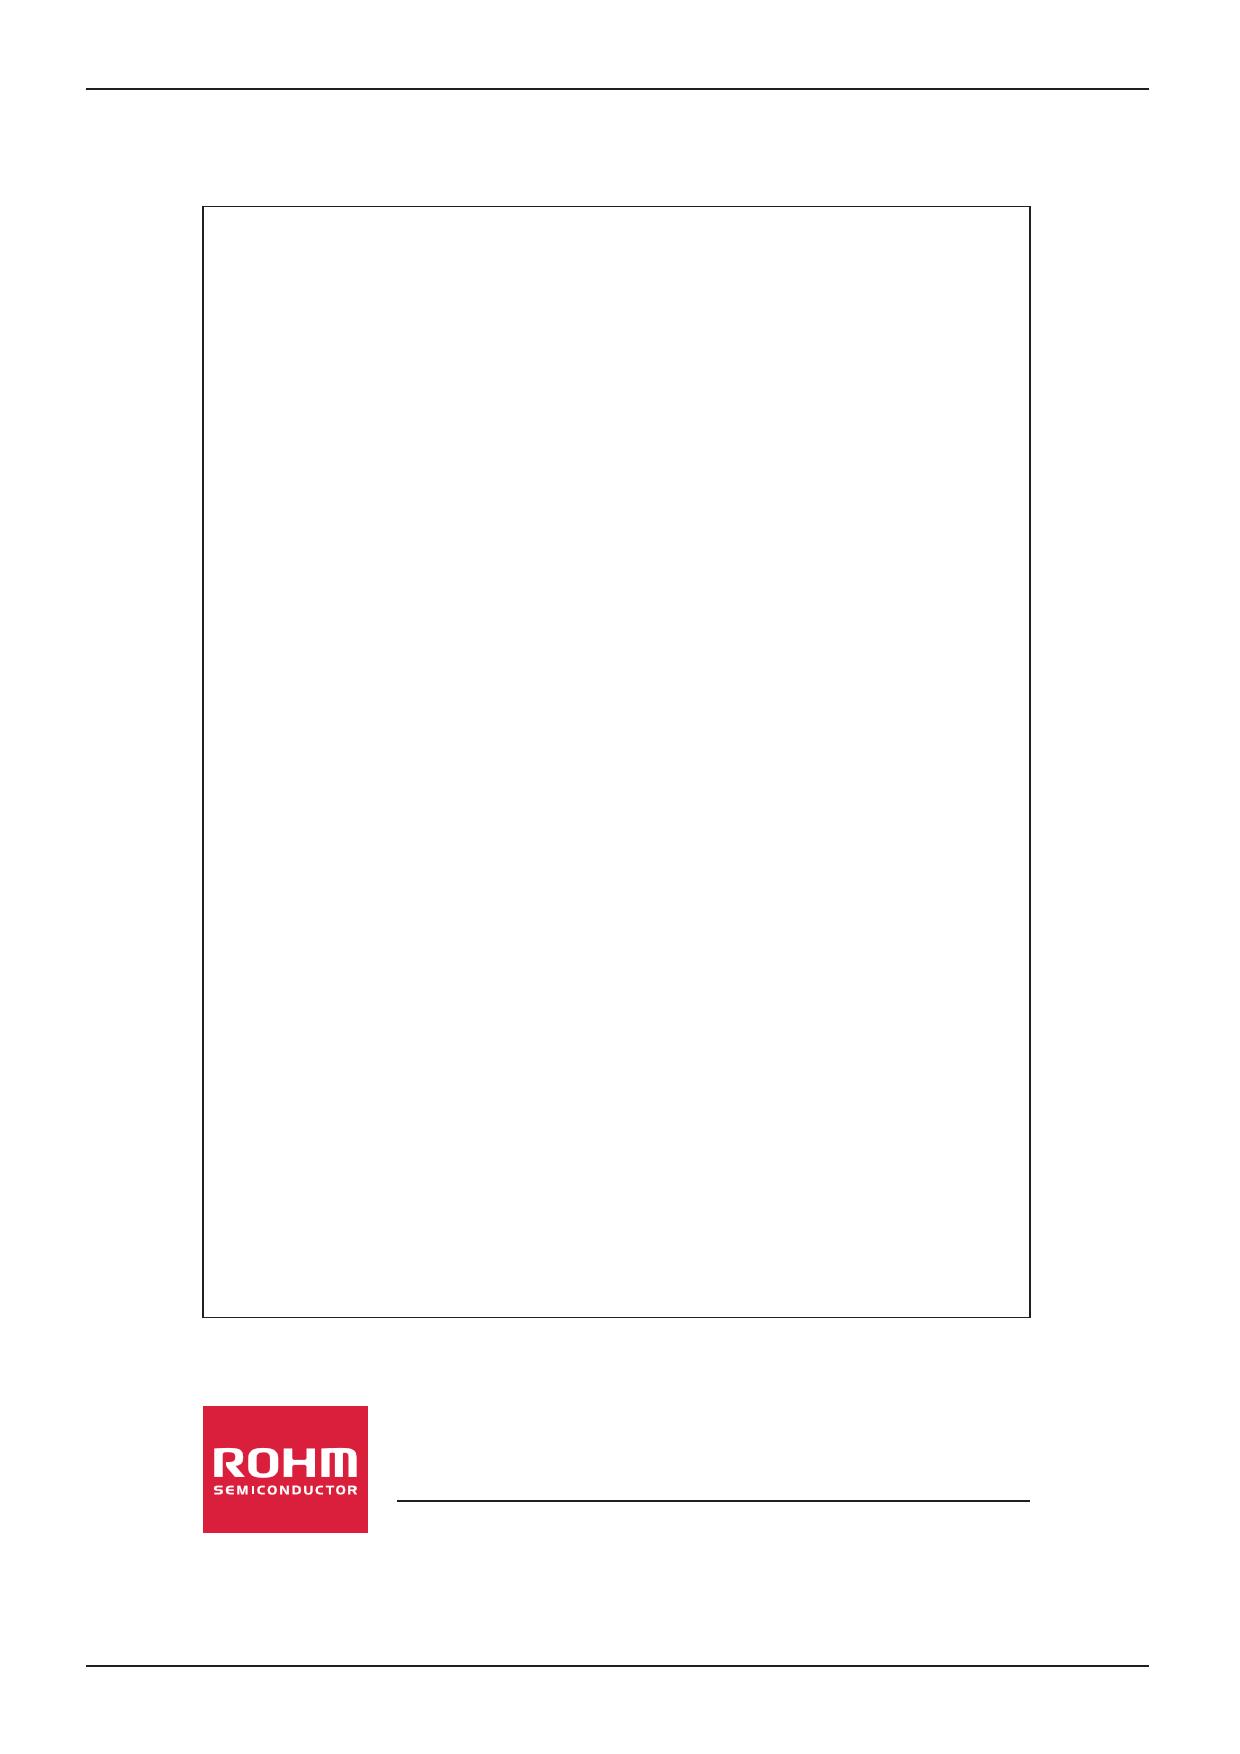 RW1C015UN pdf, datenblatt